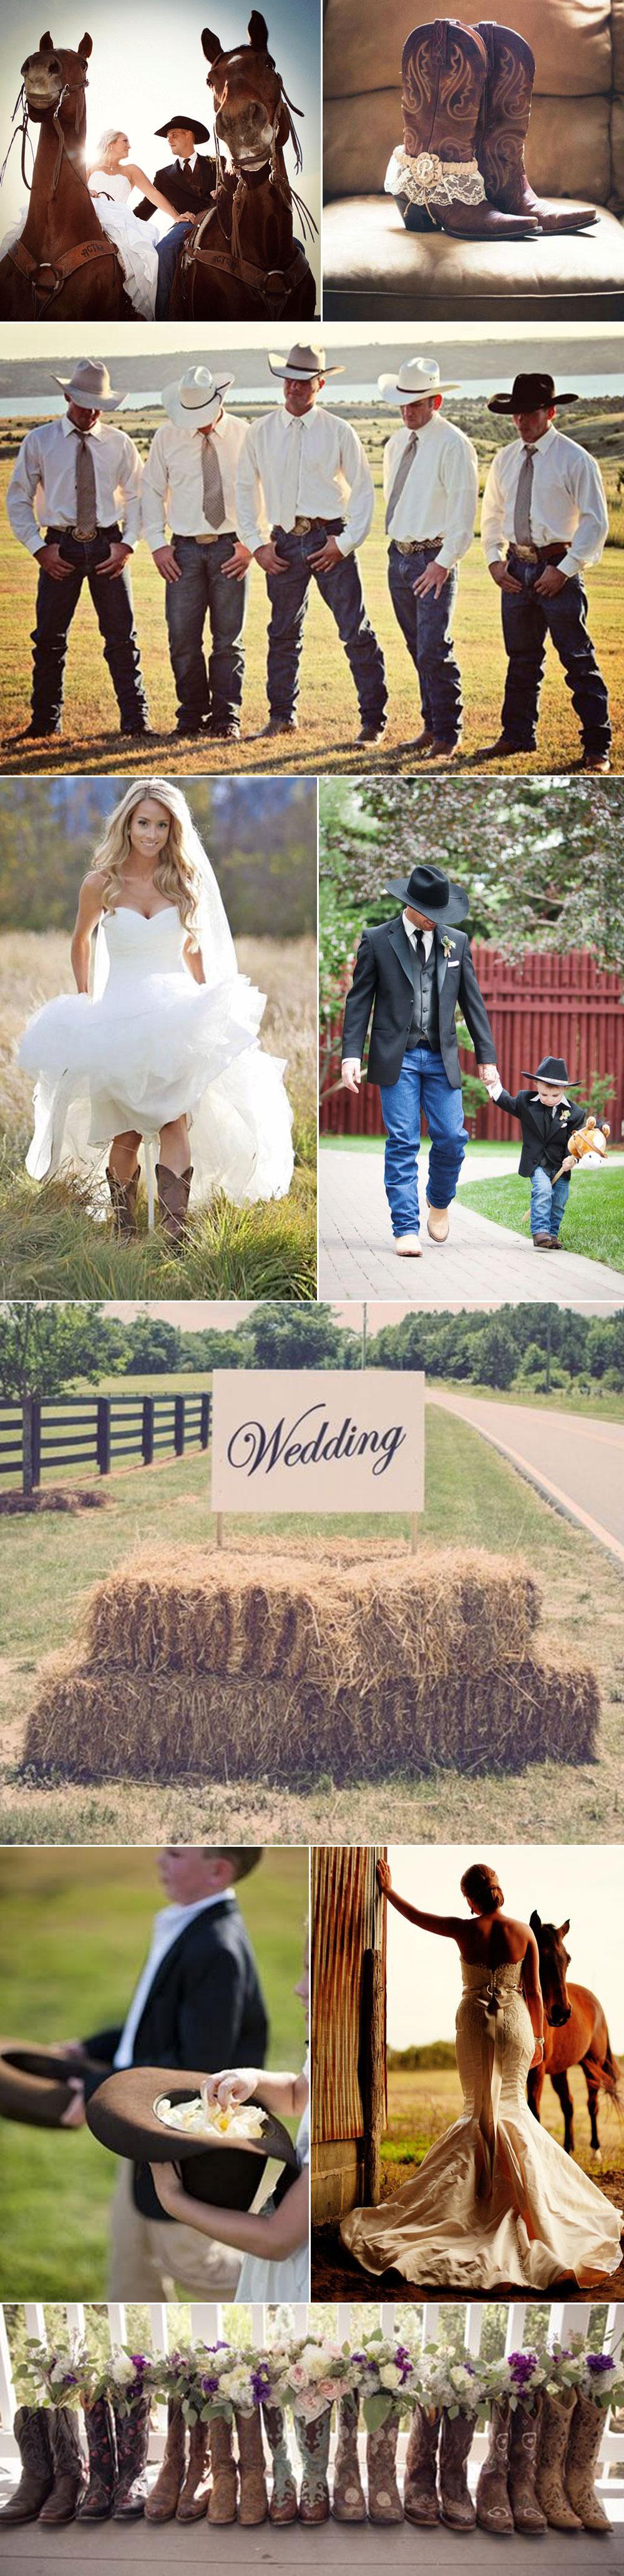 Wedding ideas for country western weddings wedding ties country western cowboy weddings junglespirit Choice Image